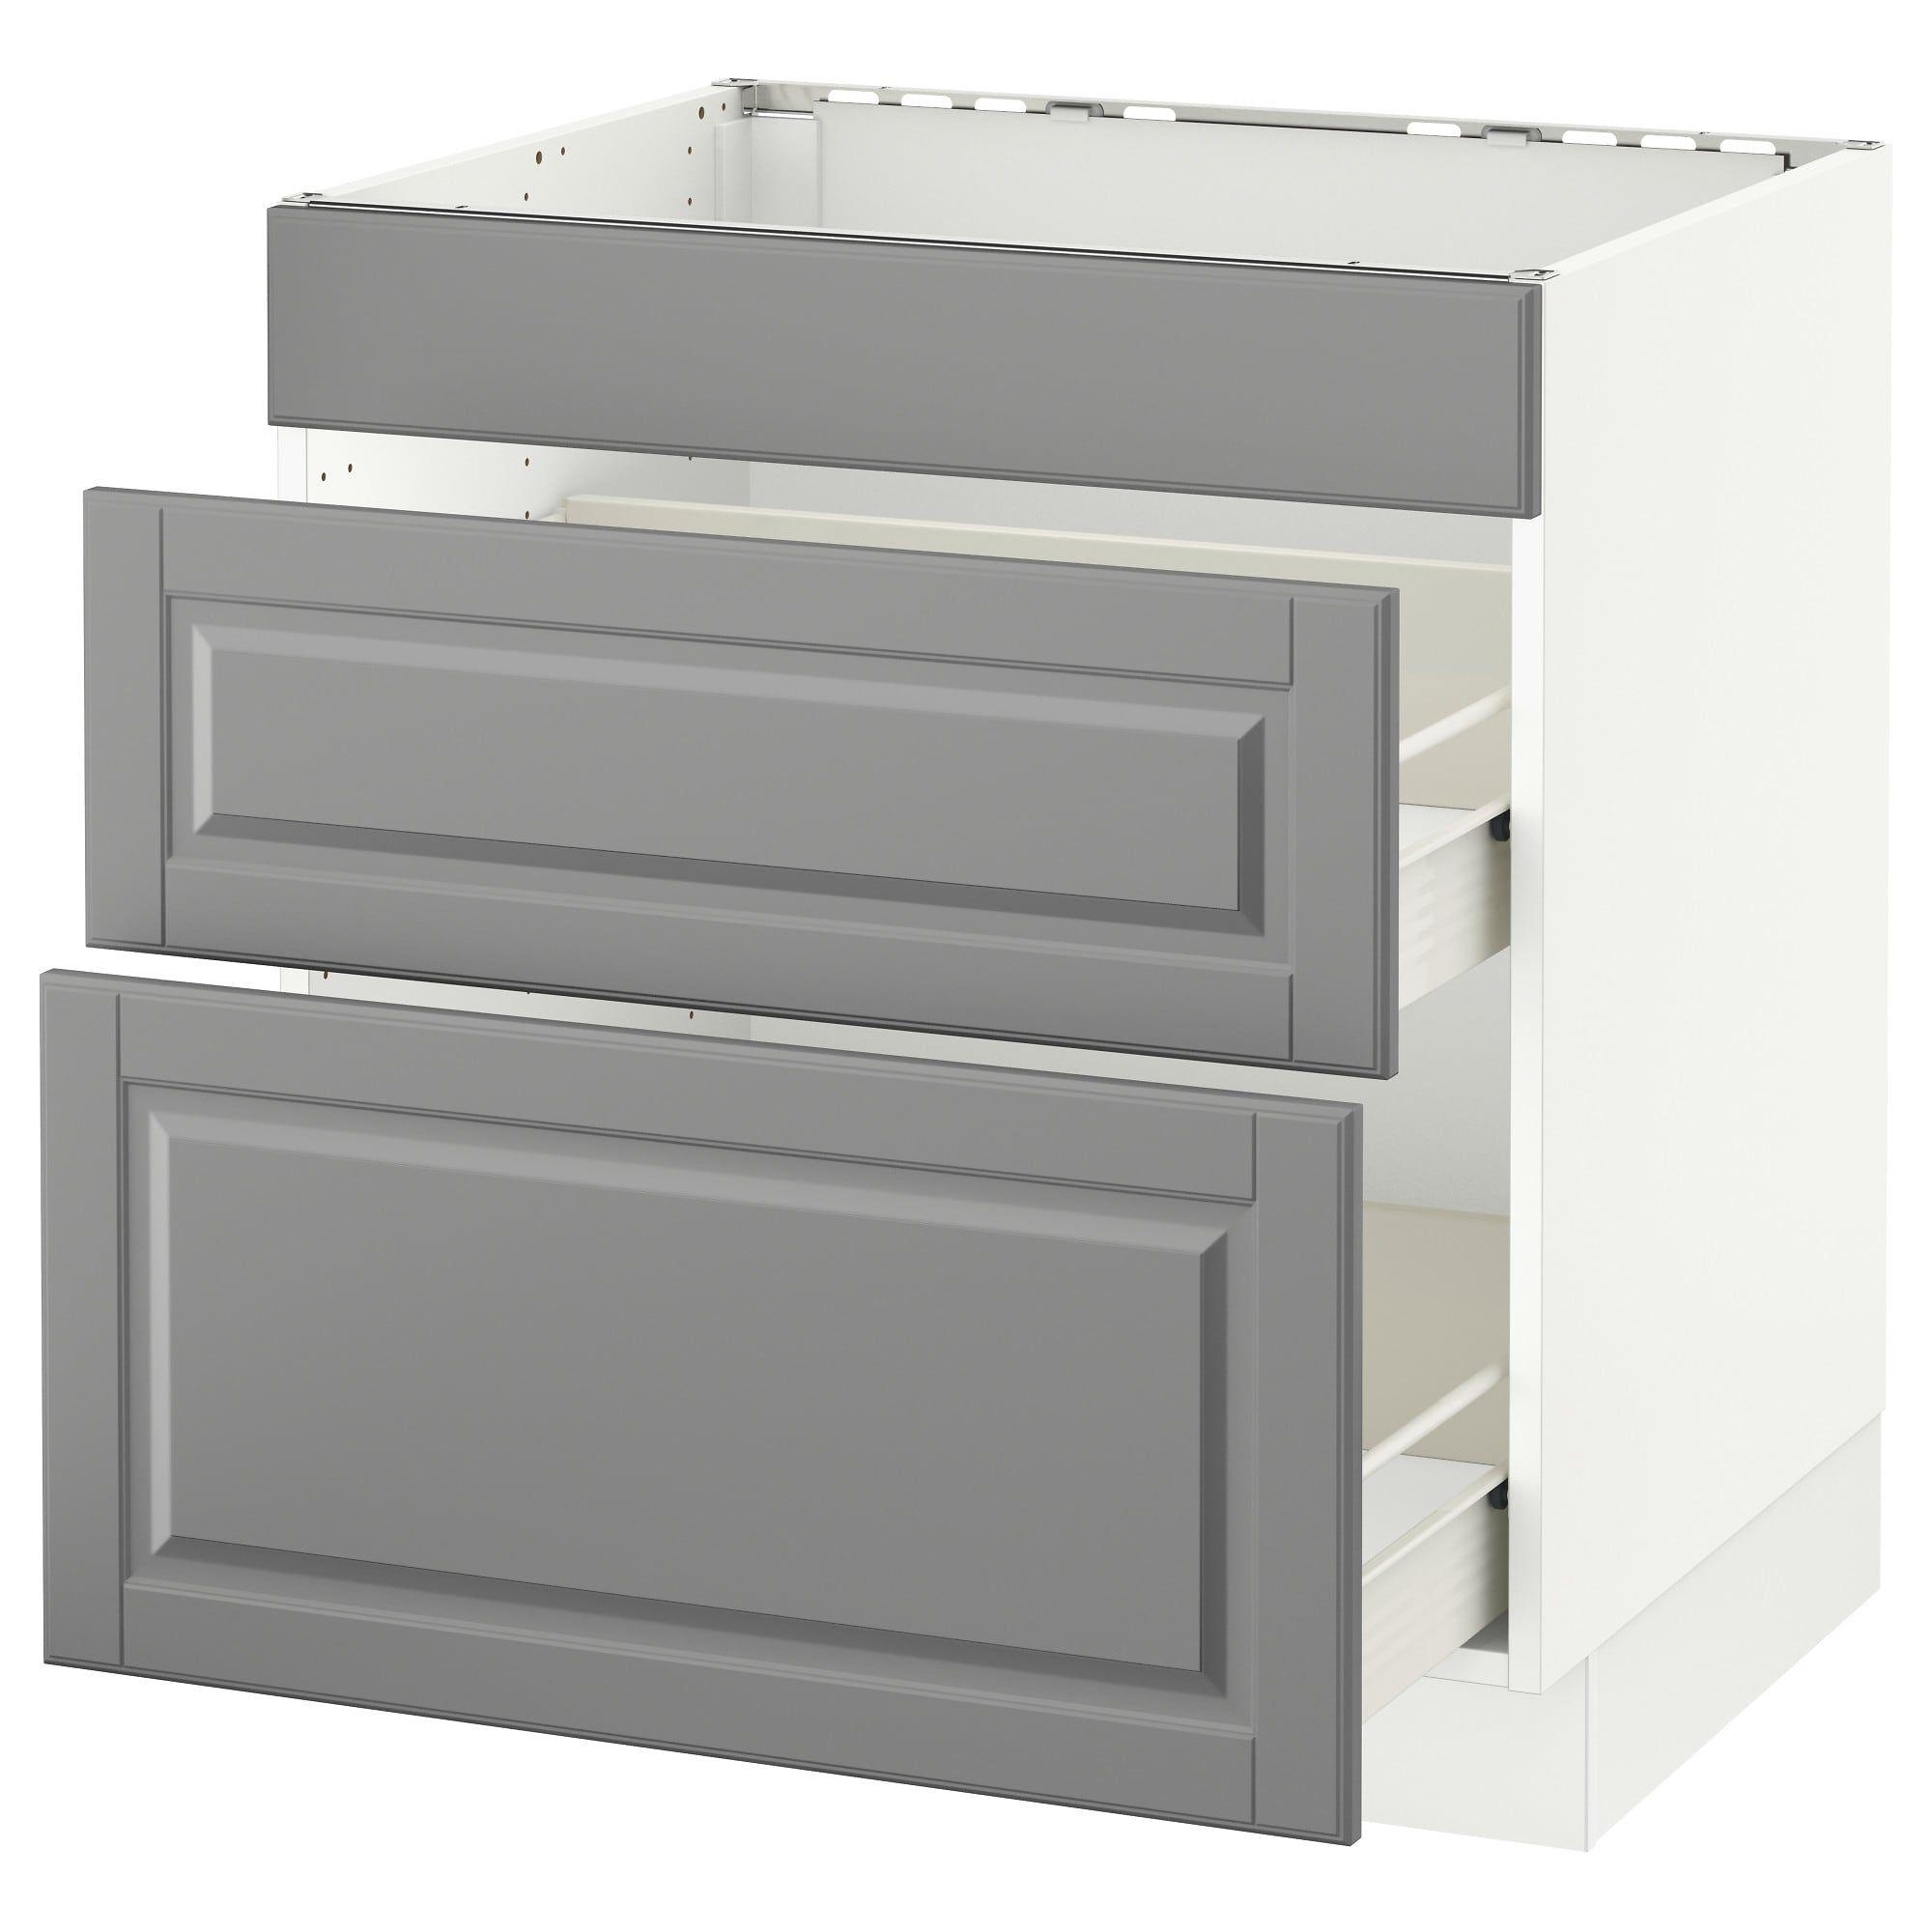 IKEA SEKTION White Förvara, Bodbyn Gray Base cab f/cooktop